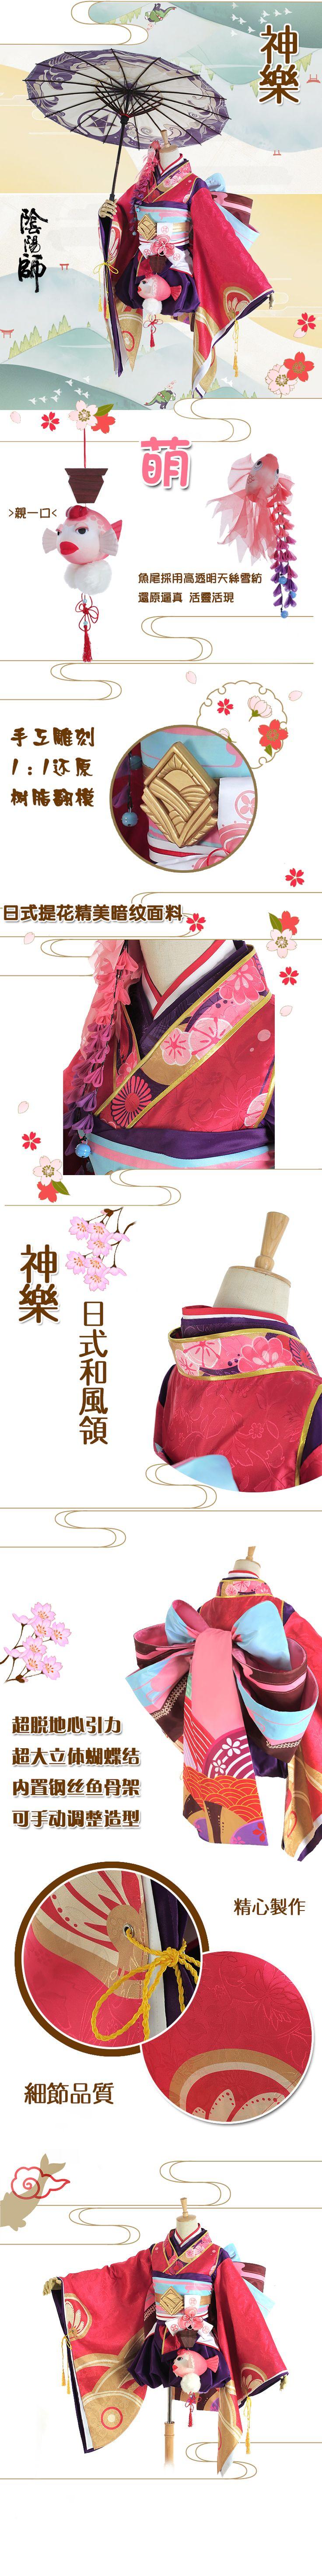 First Call] animal cat full group Onmyouji cos Kagura cosplay suit umbrella wind sent two headdress - Taobao global Station